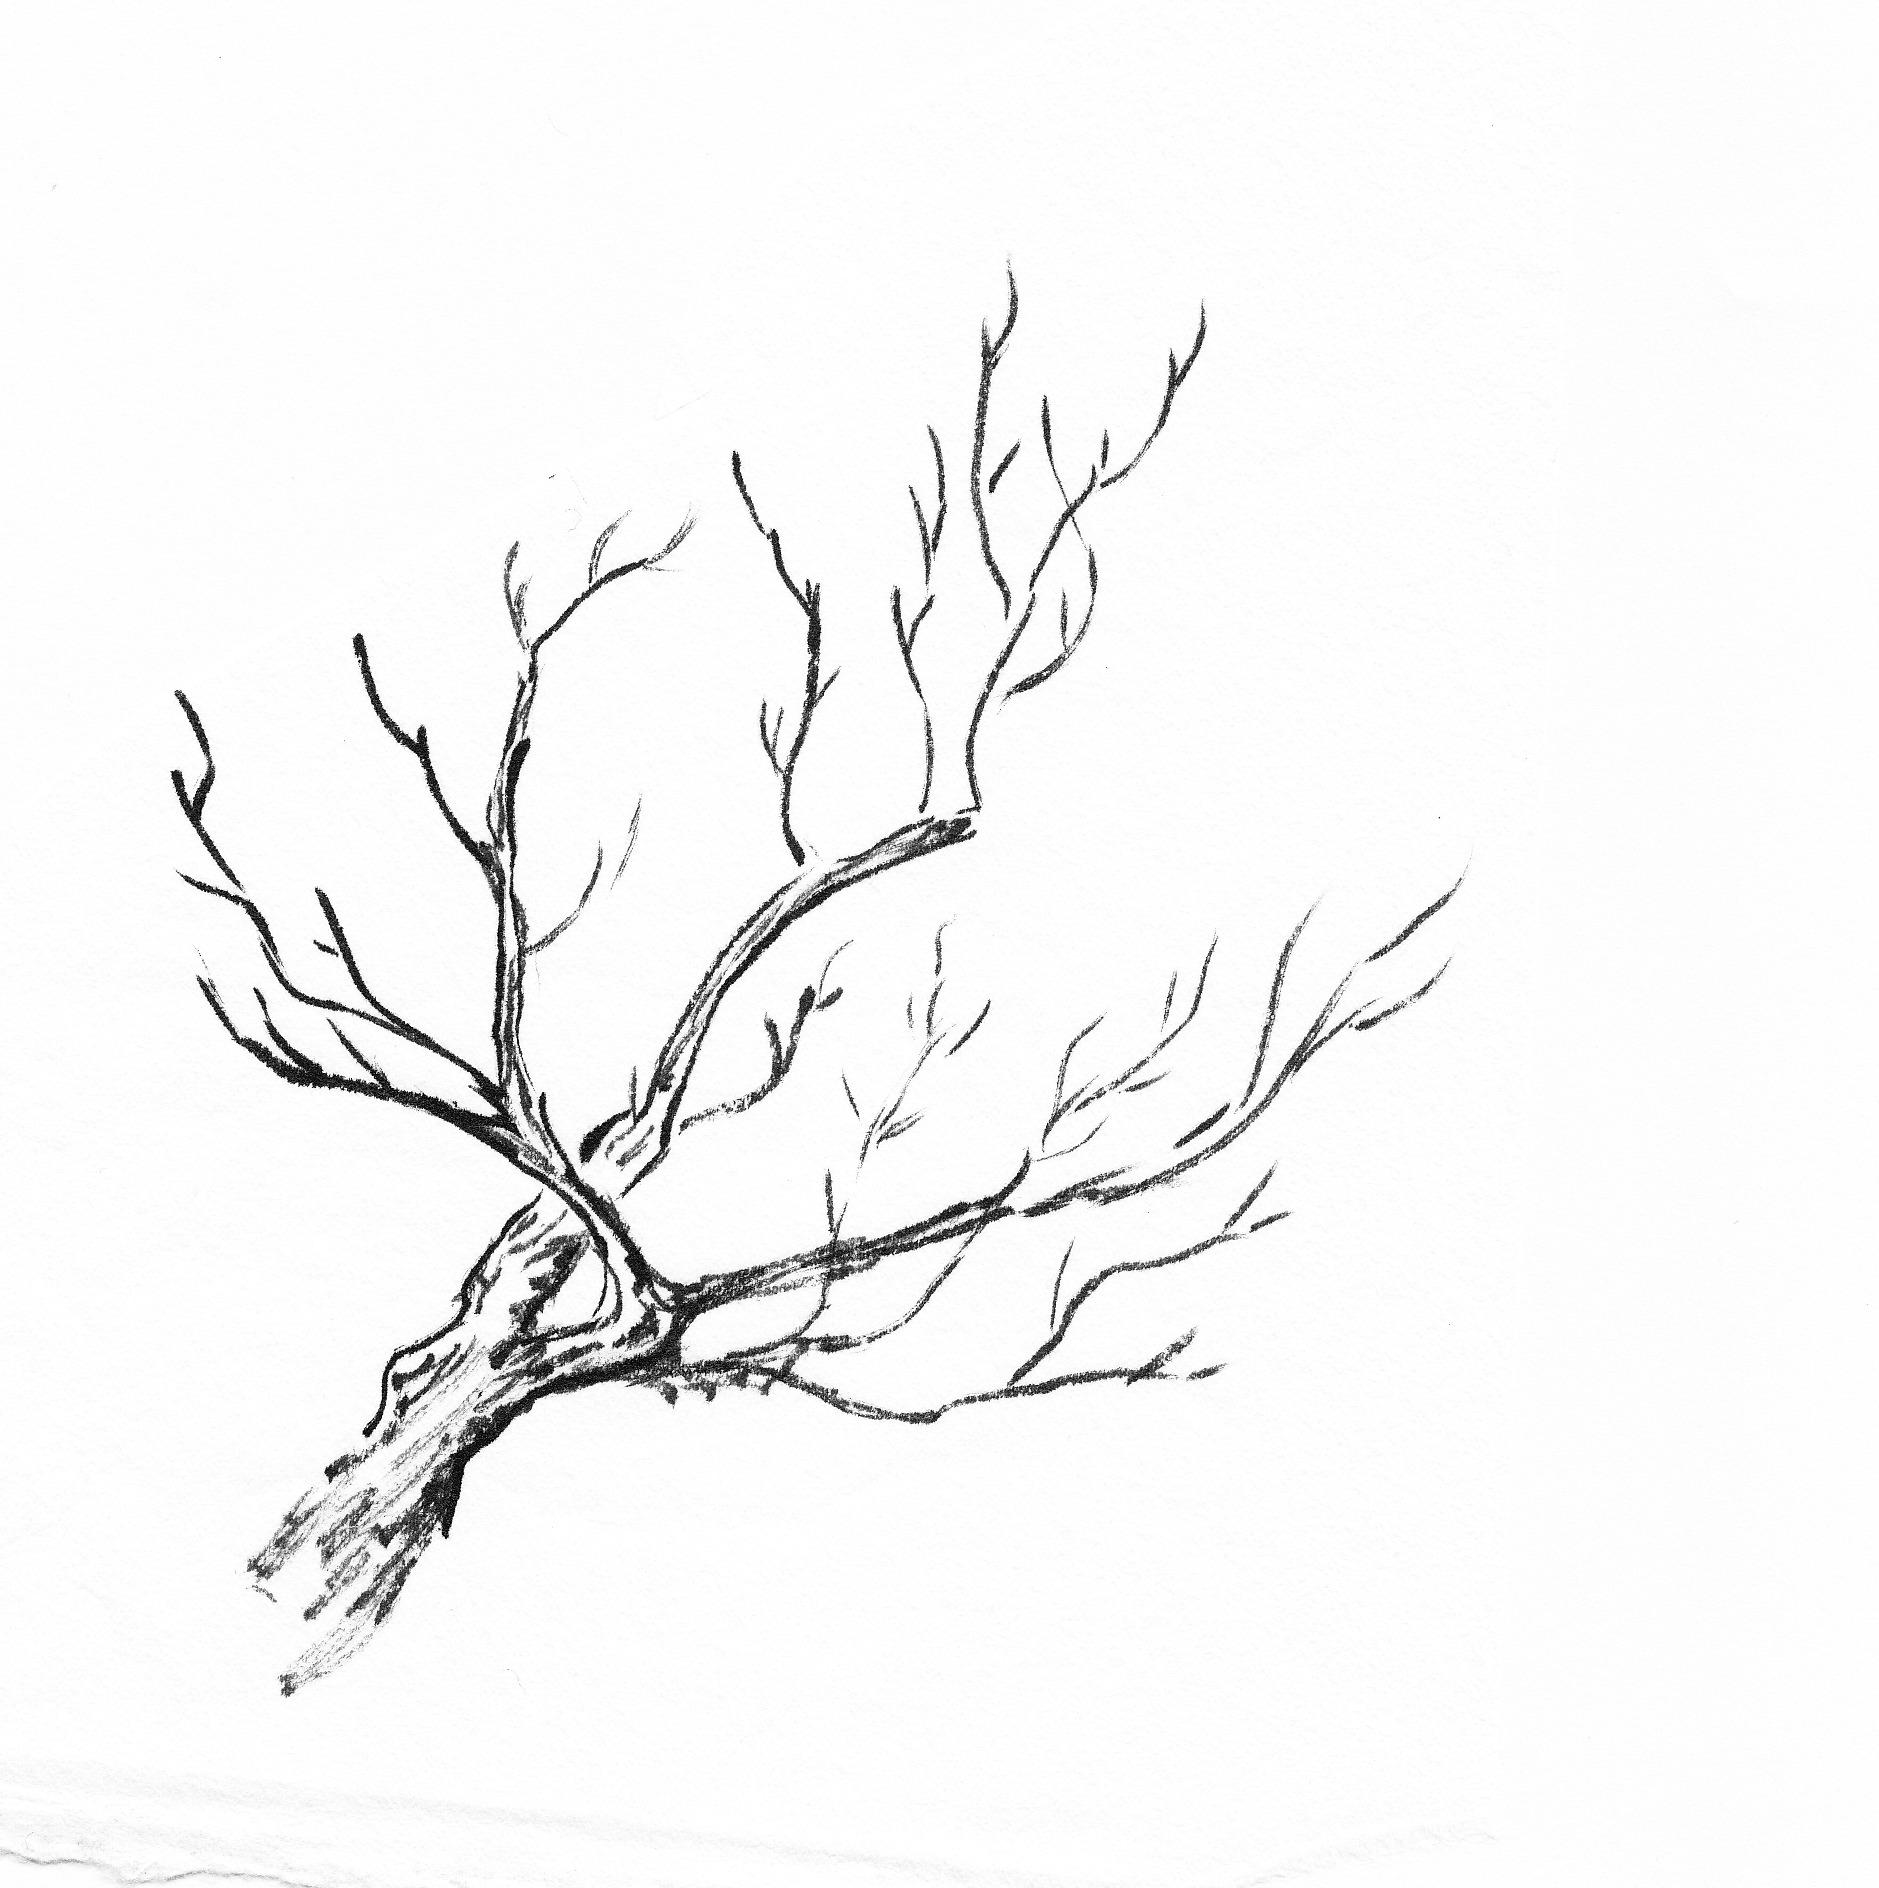 Treebranchestwist